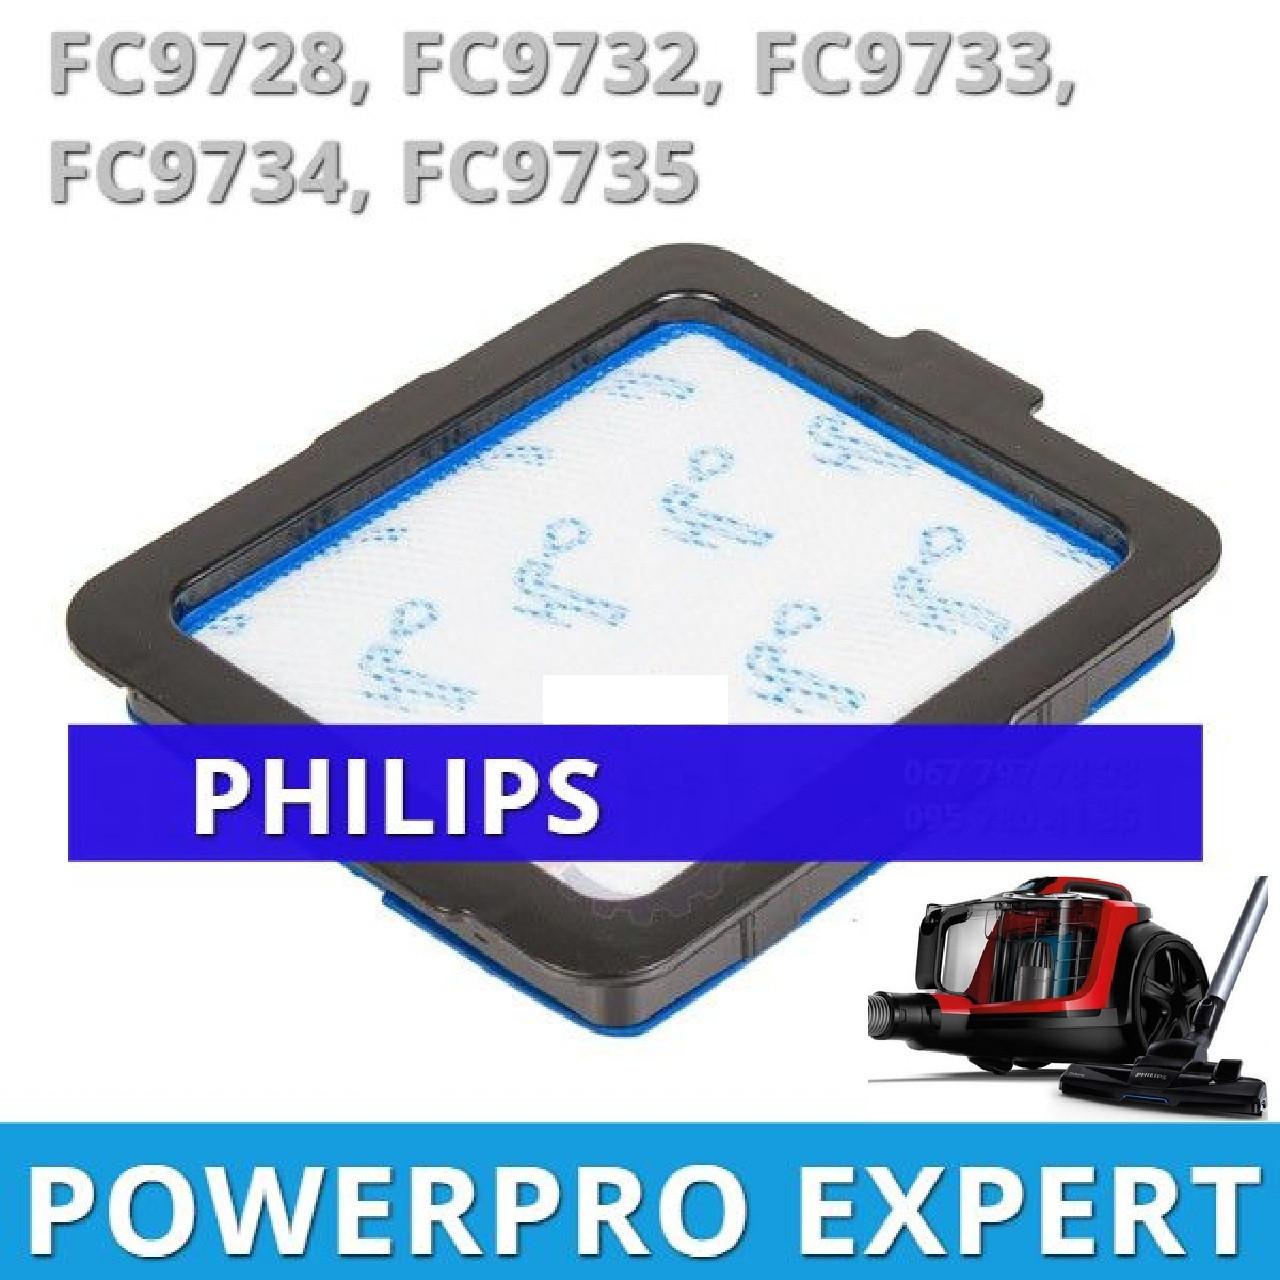 Рамка фильтра пылесоса Philips PowerpPro Expert fc9728/01, fc9729, fc9732/01, fc9733/01, fc9734/01, fc9735/01